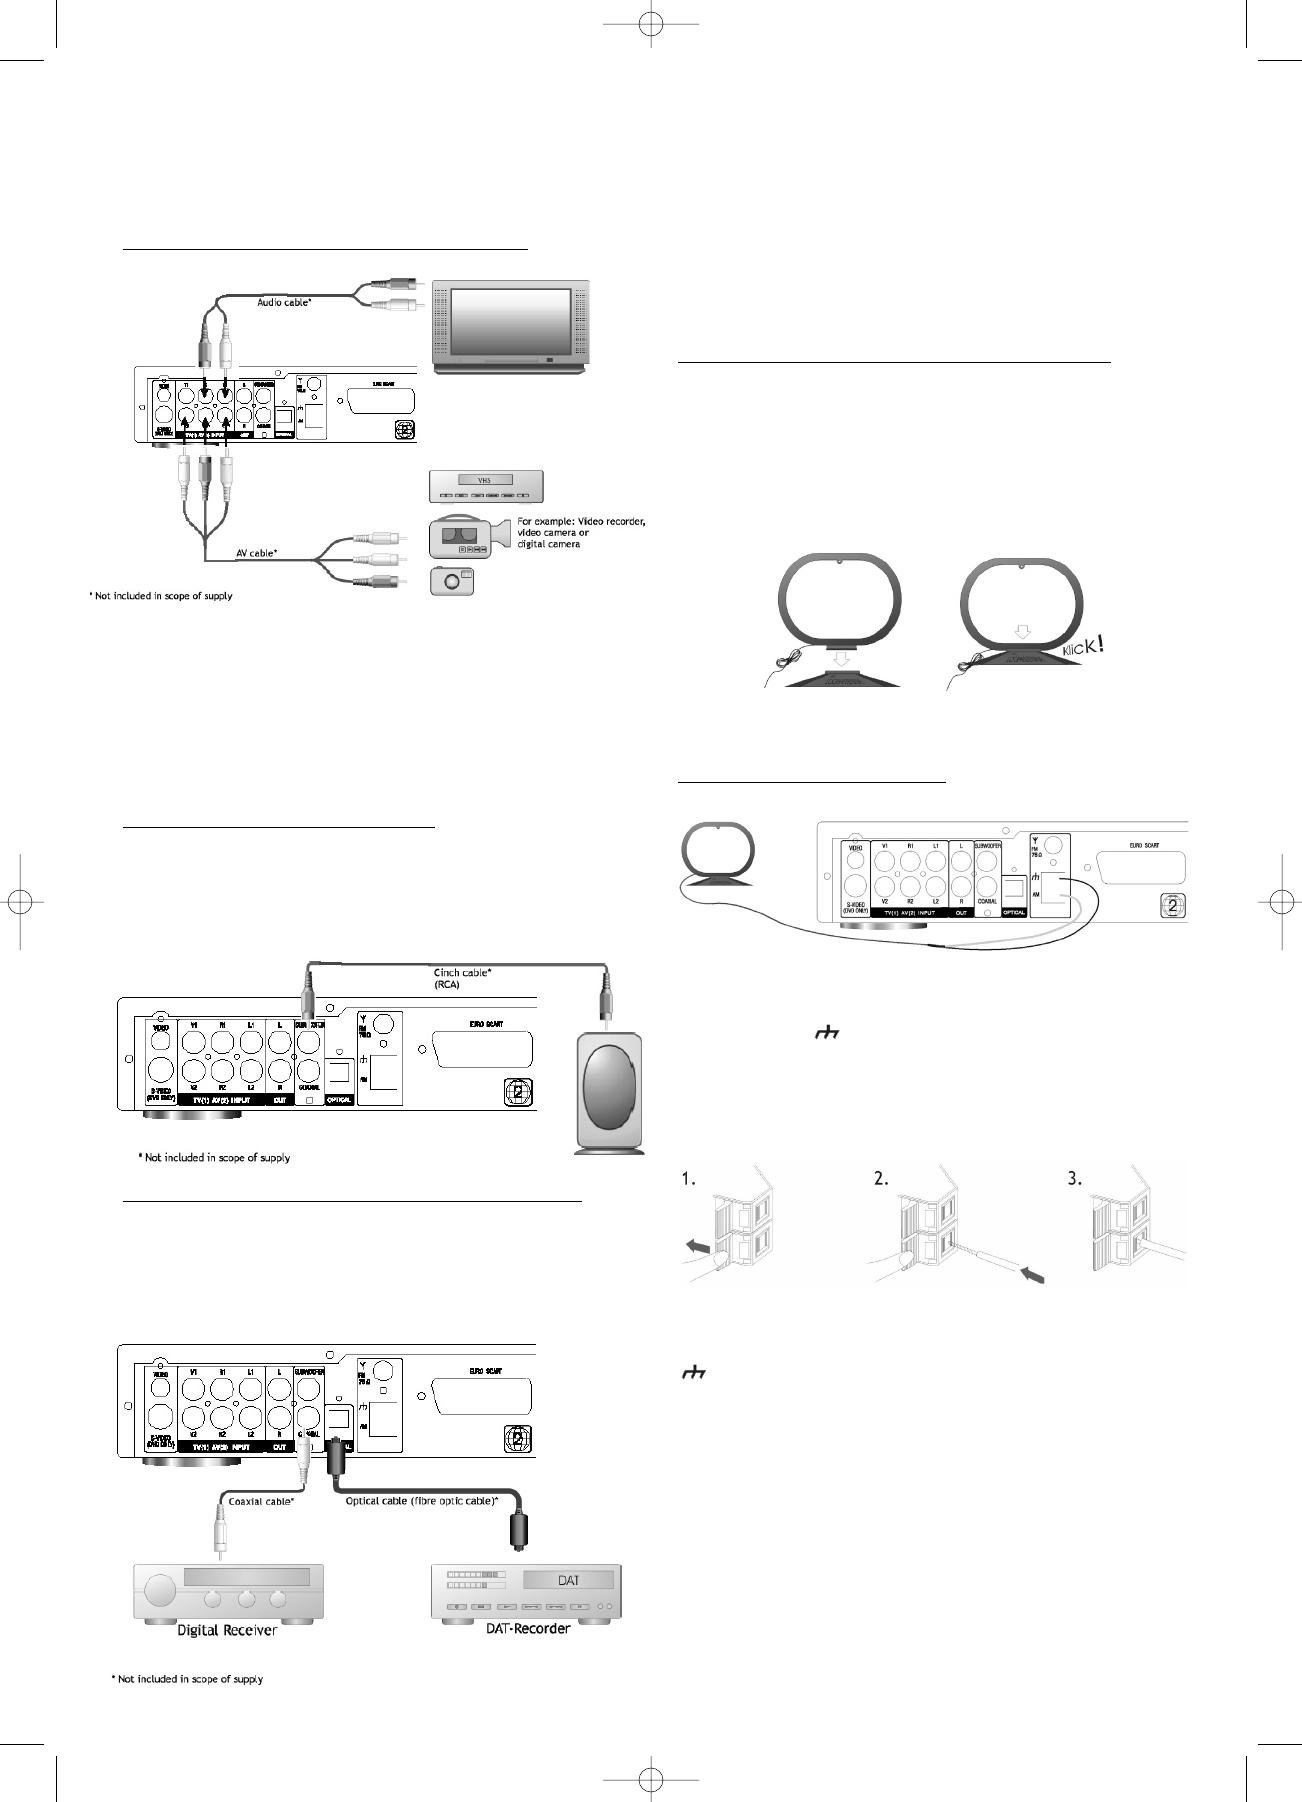 Handleiding Bomann DVD 568 HC CB (pagina 22 van 36) (Deutsch, English)